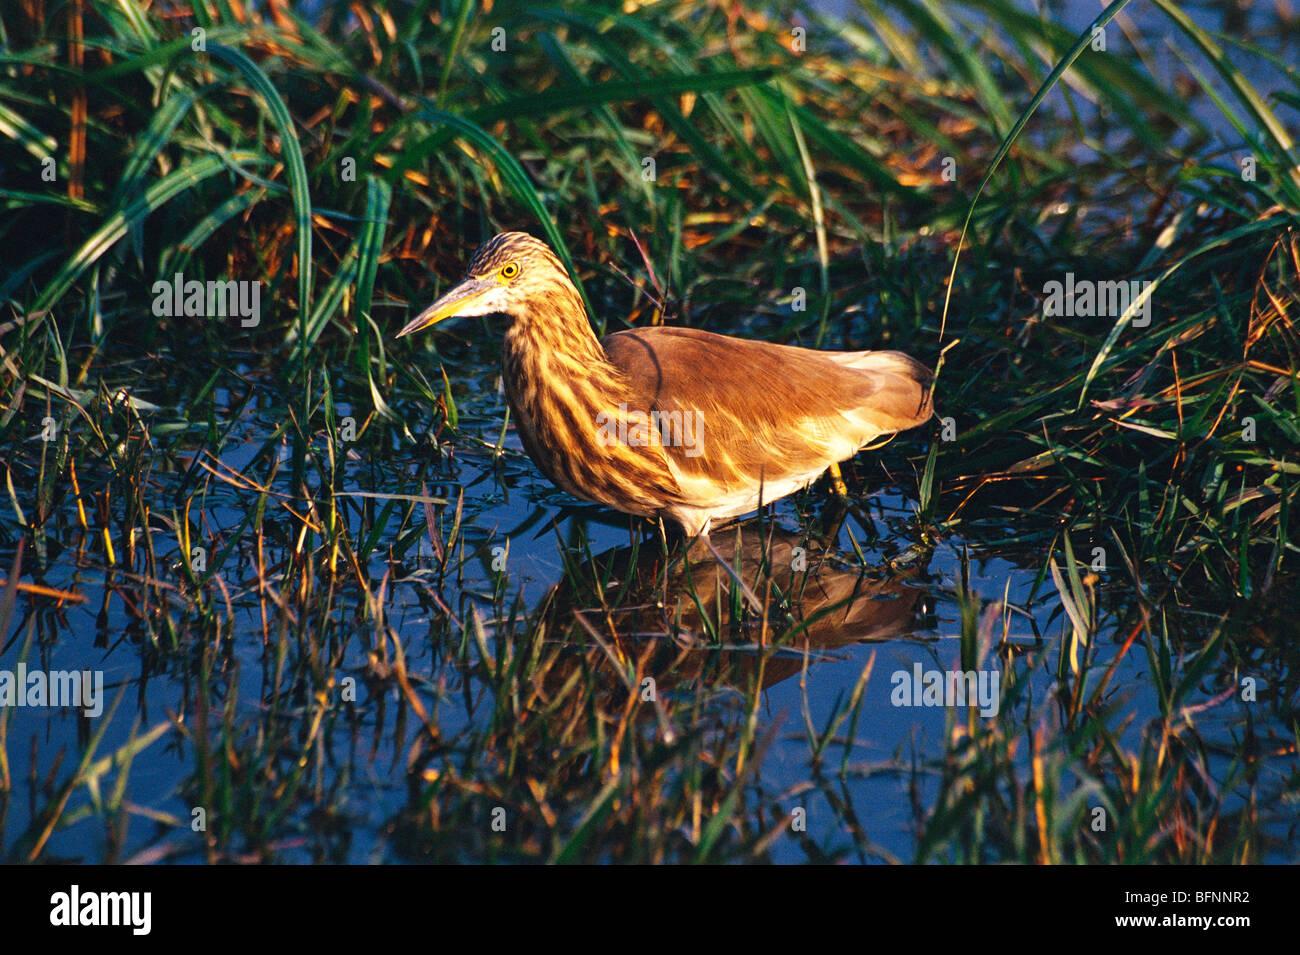 UGA 60172 : Birds ; Pond Heron ardeola grayii ; Bharatpur bird sanctuary ; Rajasthan ; India - Stock Image